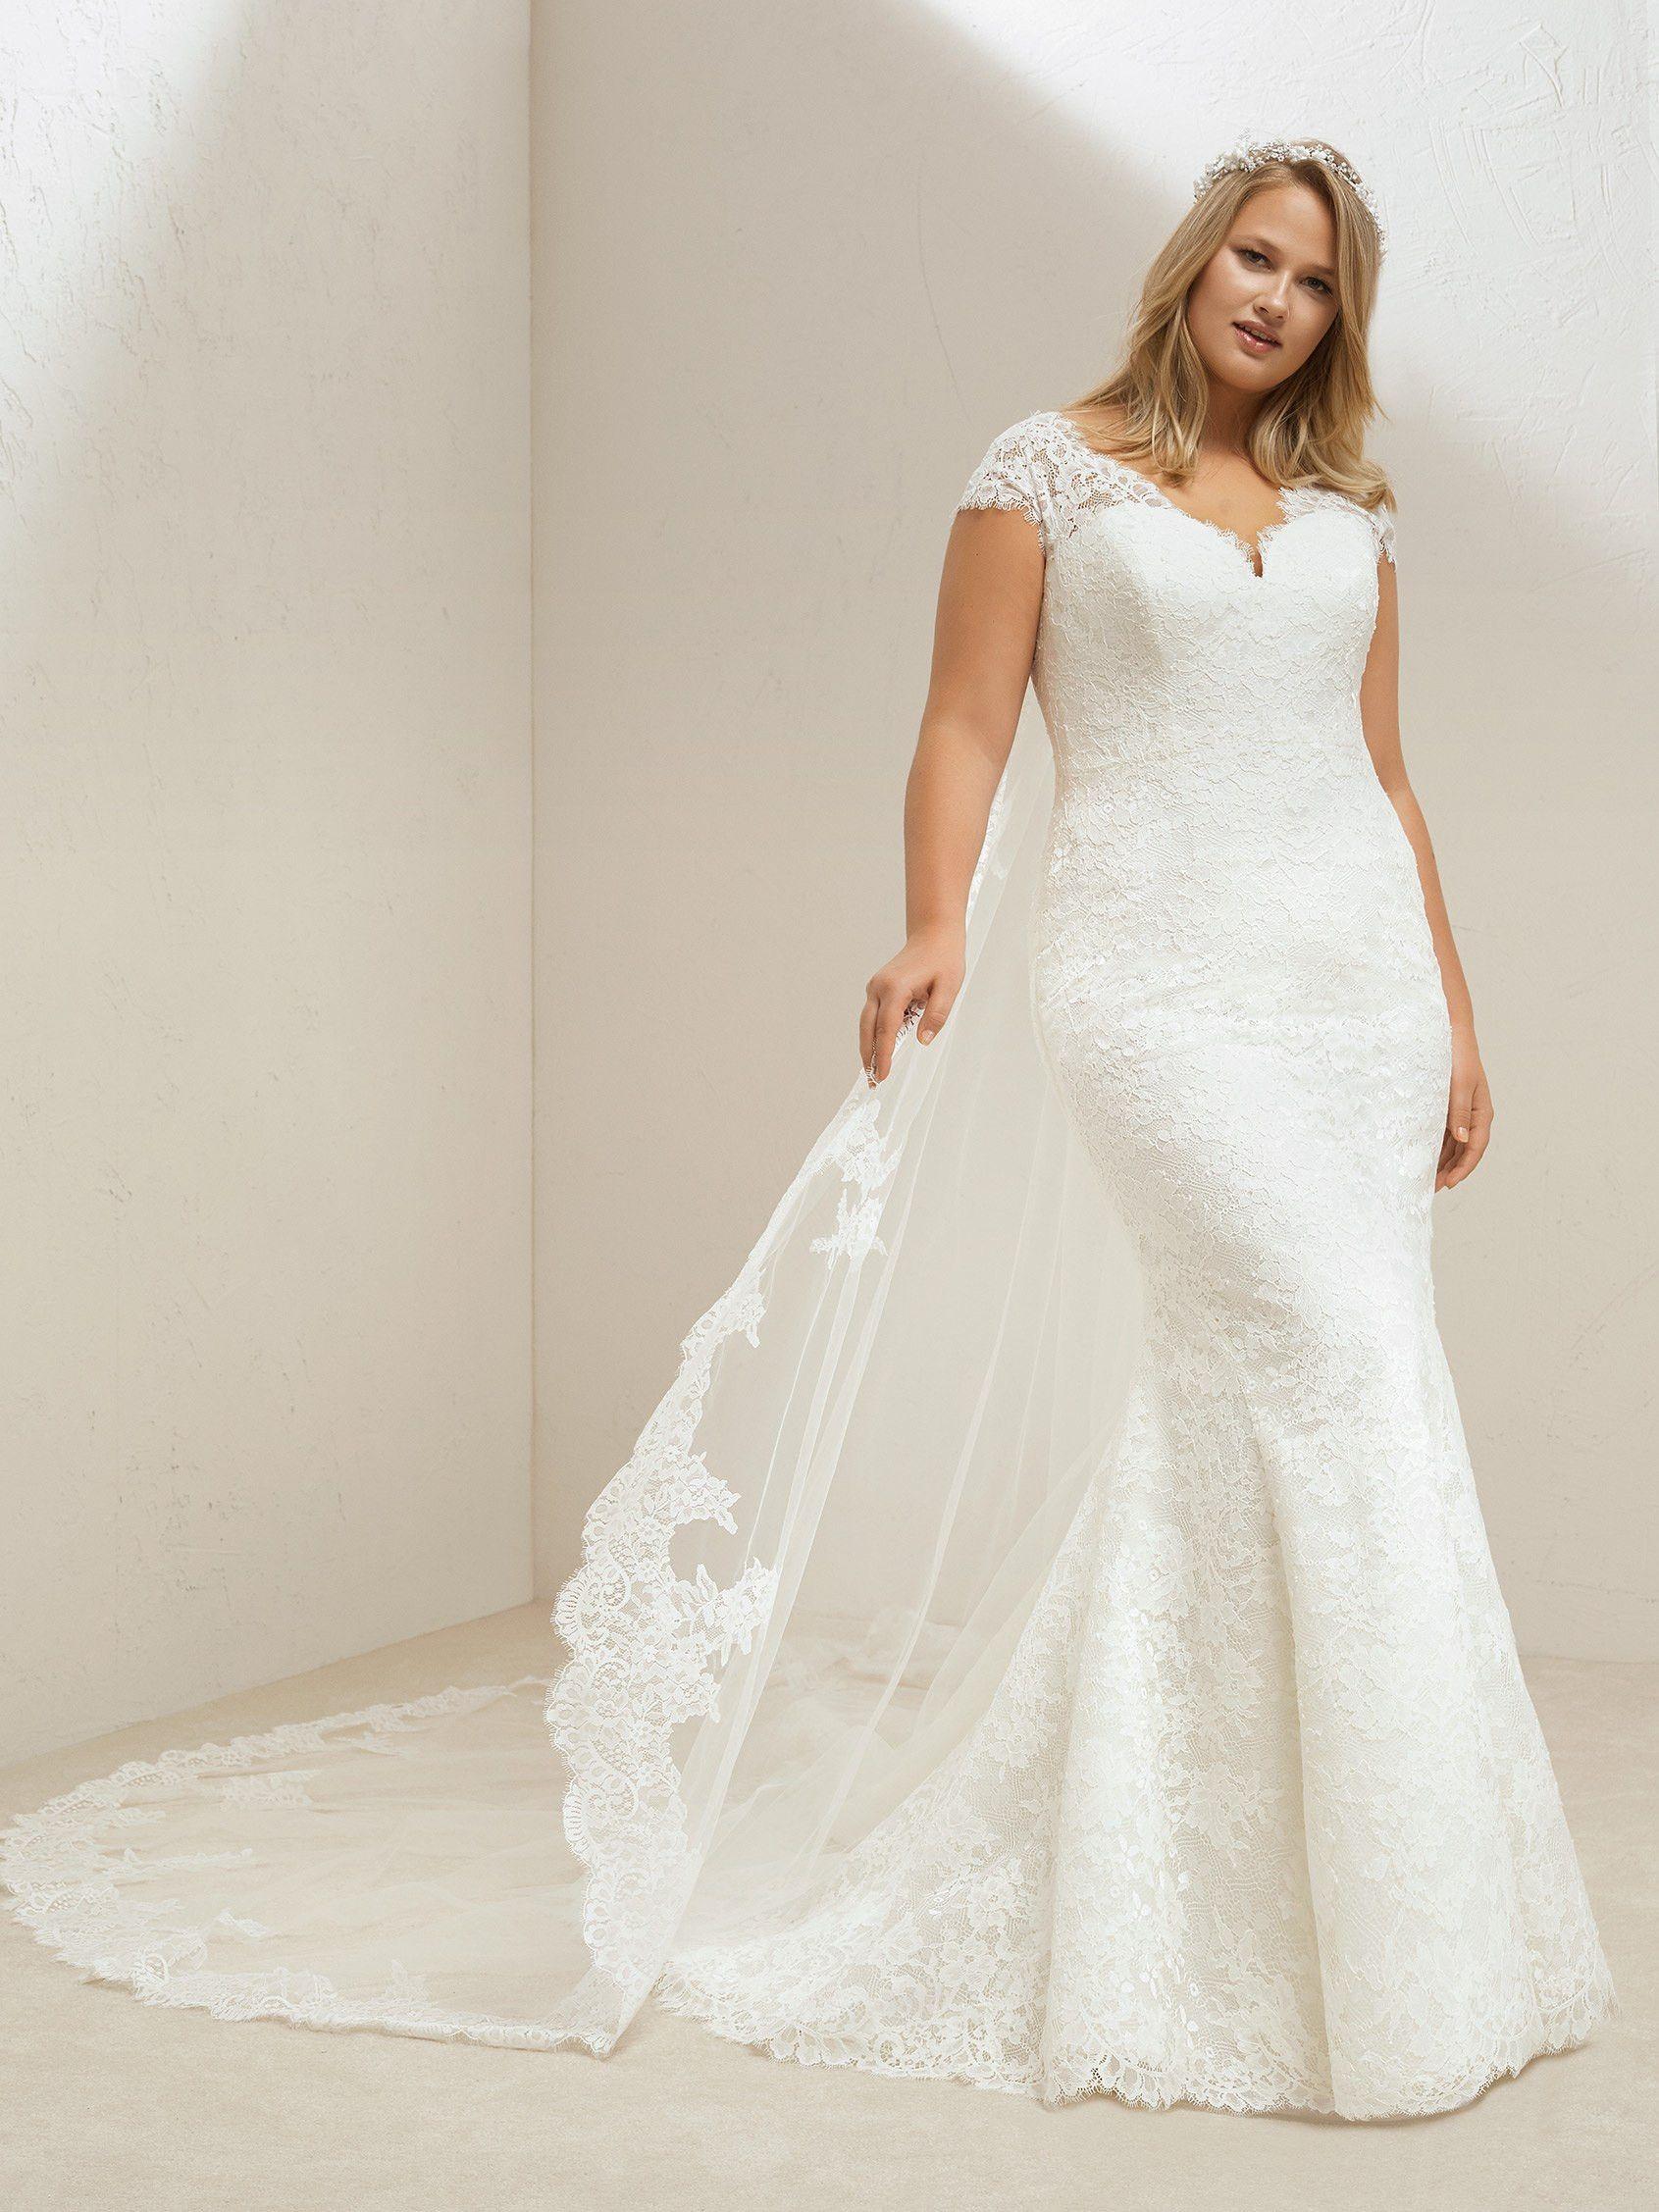 Lovely Plus Size Lace Mermaid Wedding Dress Pronovias Mali Plus Wedding Dresses Wedding Dresses Wedding Dress Styles Guide [ 2255 x 1691 Pixel ]